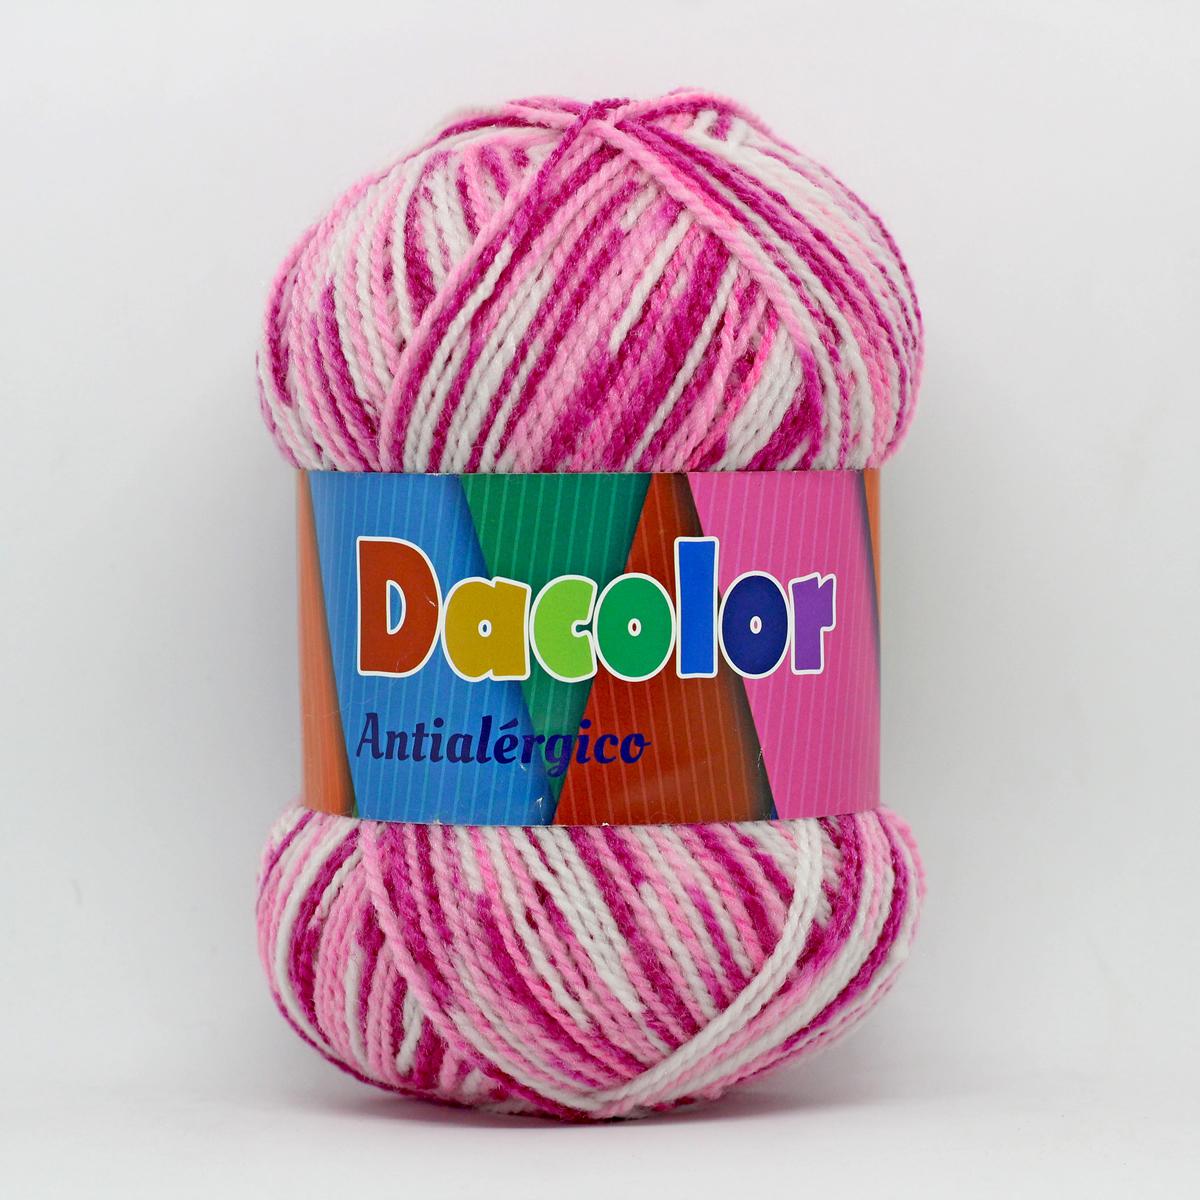 Dacolor - 58